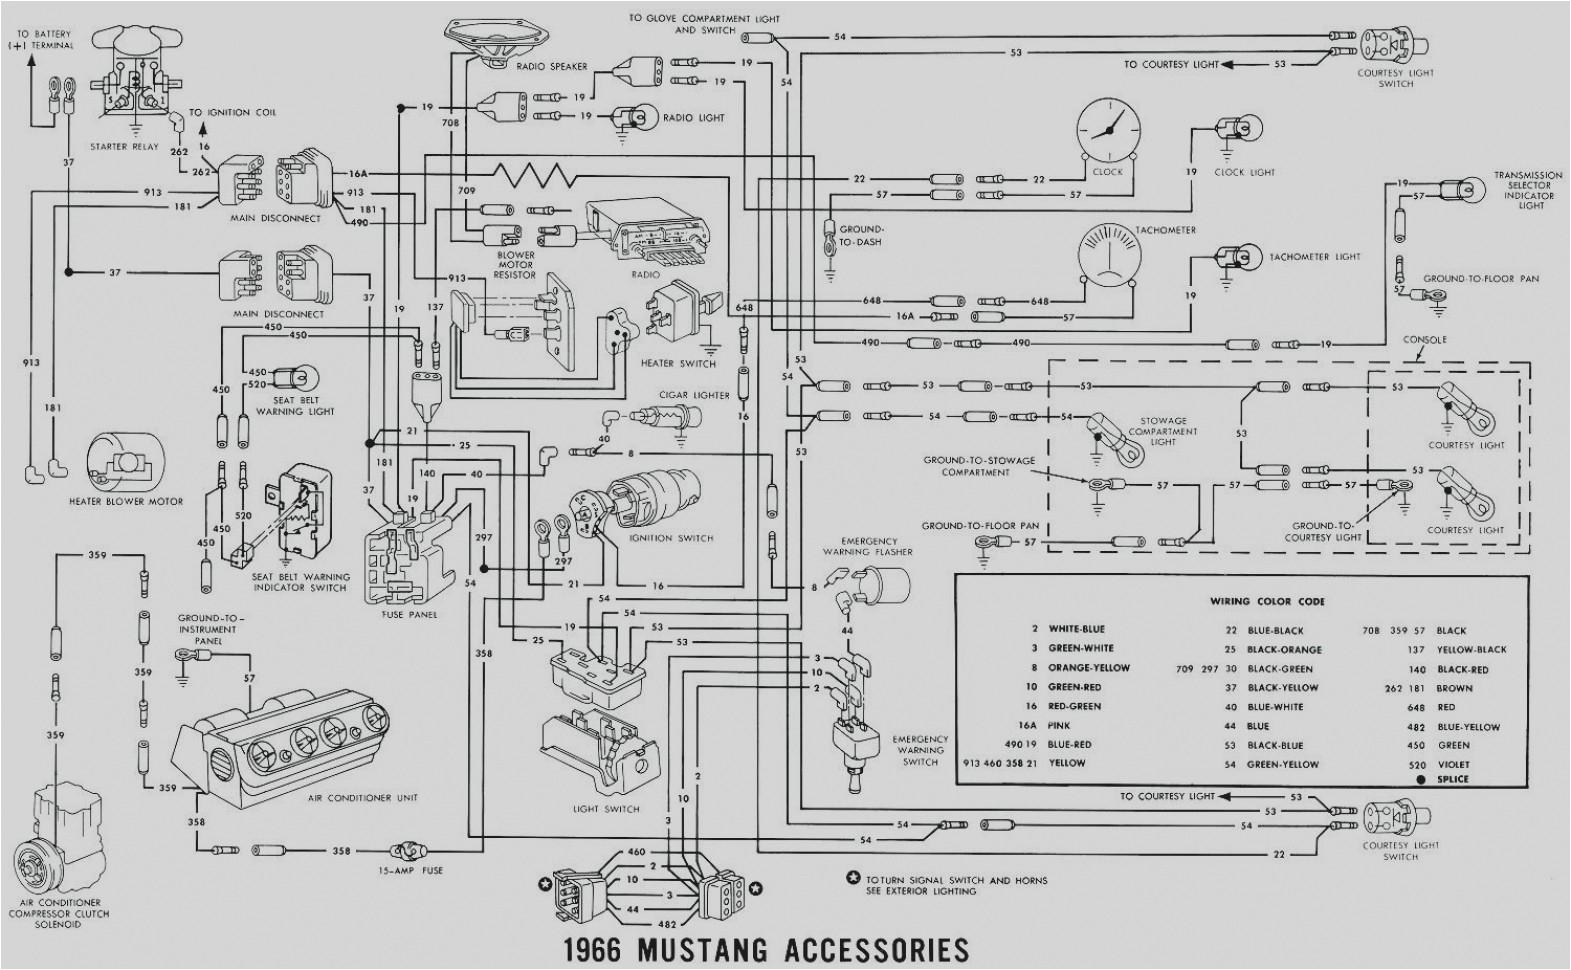 2001 mustang wiring schematic wiring diagram blog 2001 mustang wiring diagram pdf